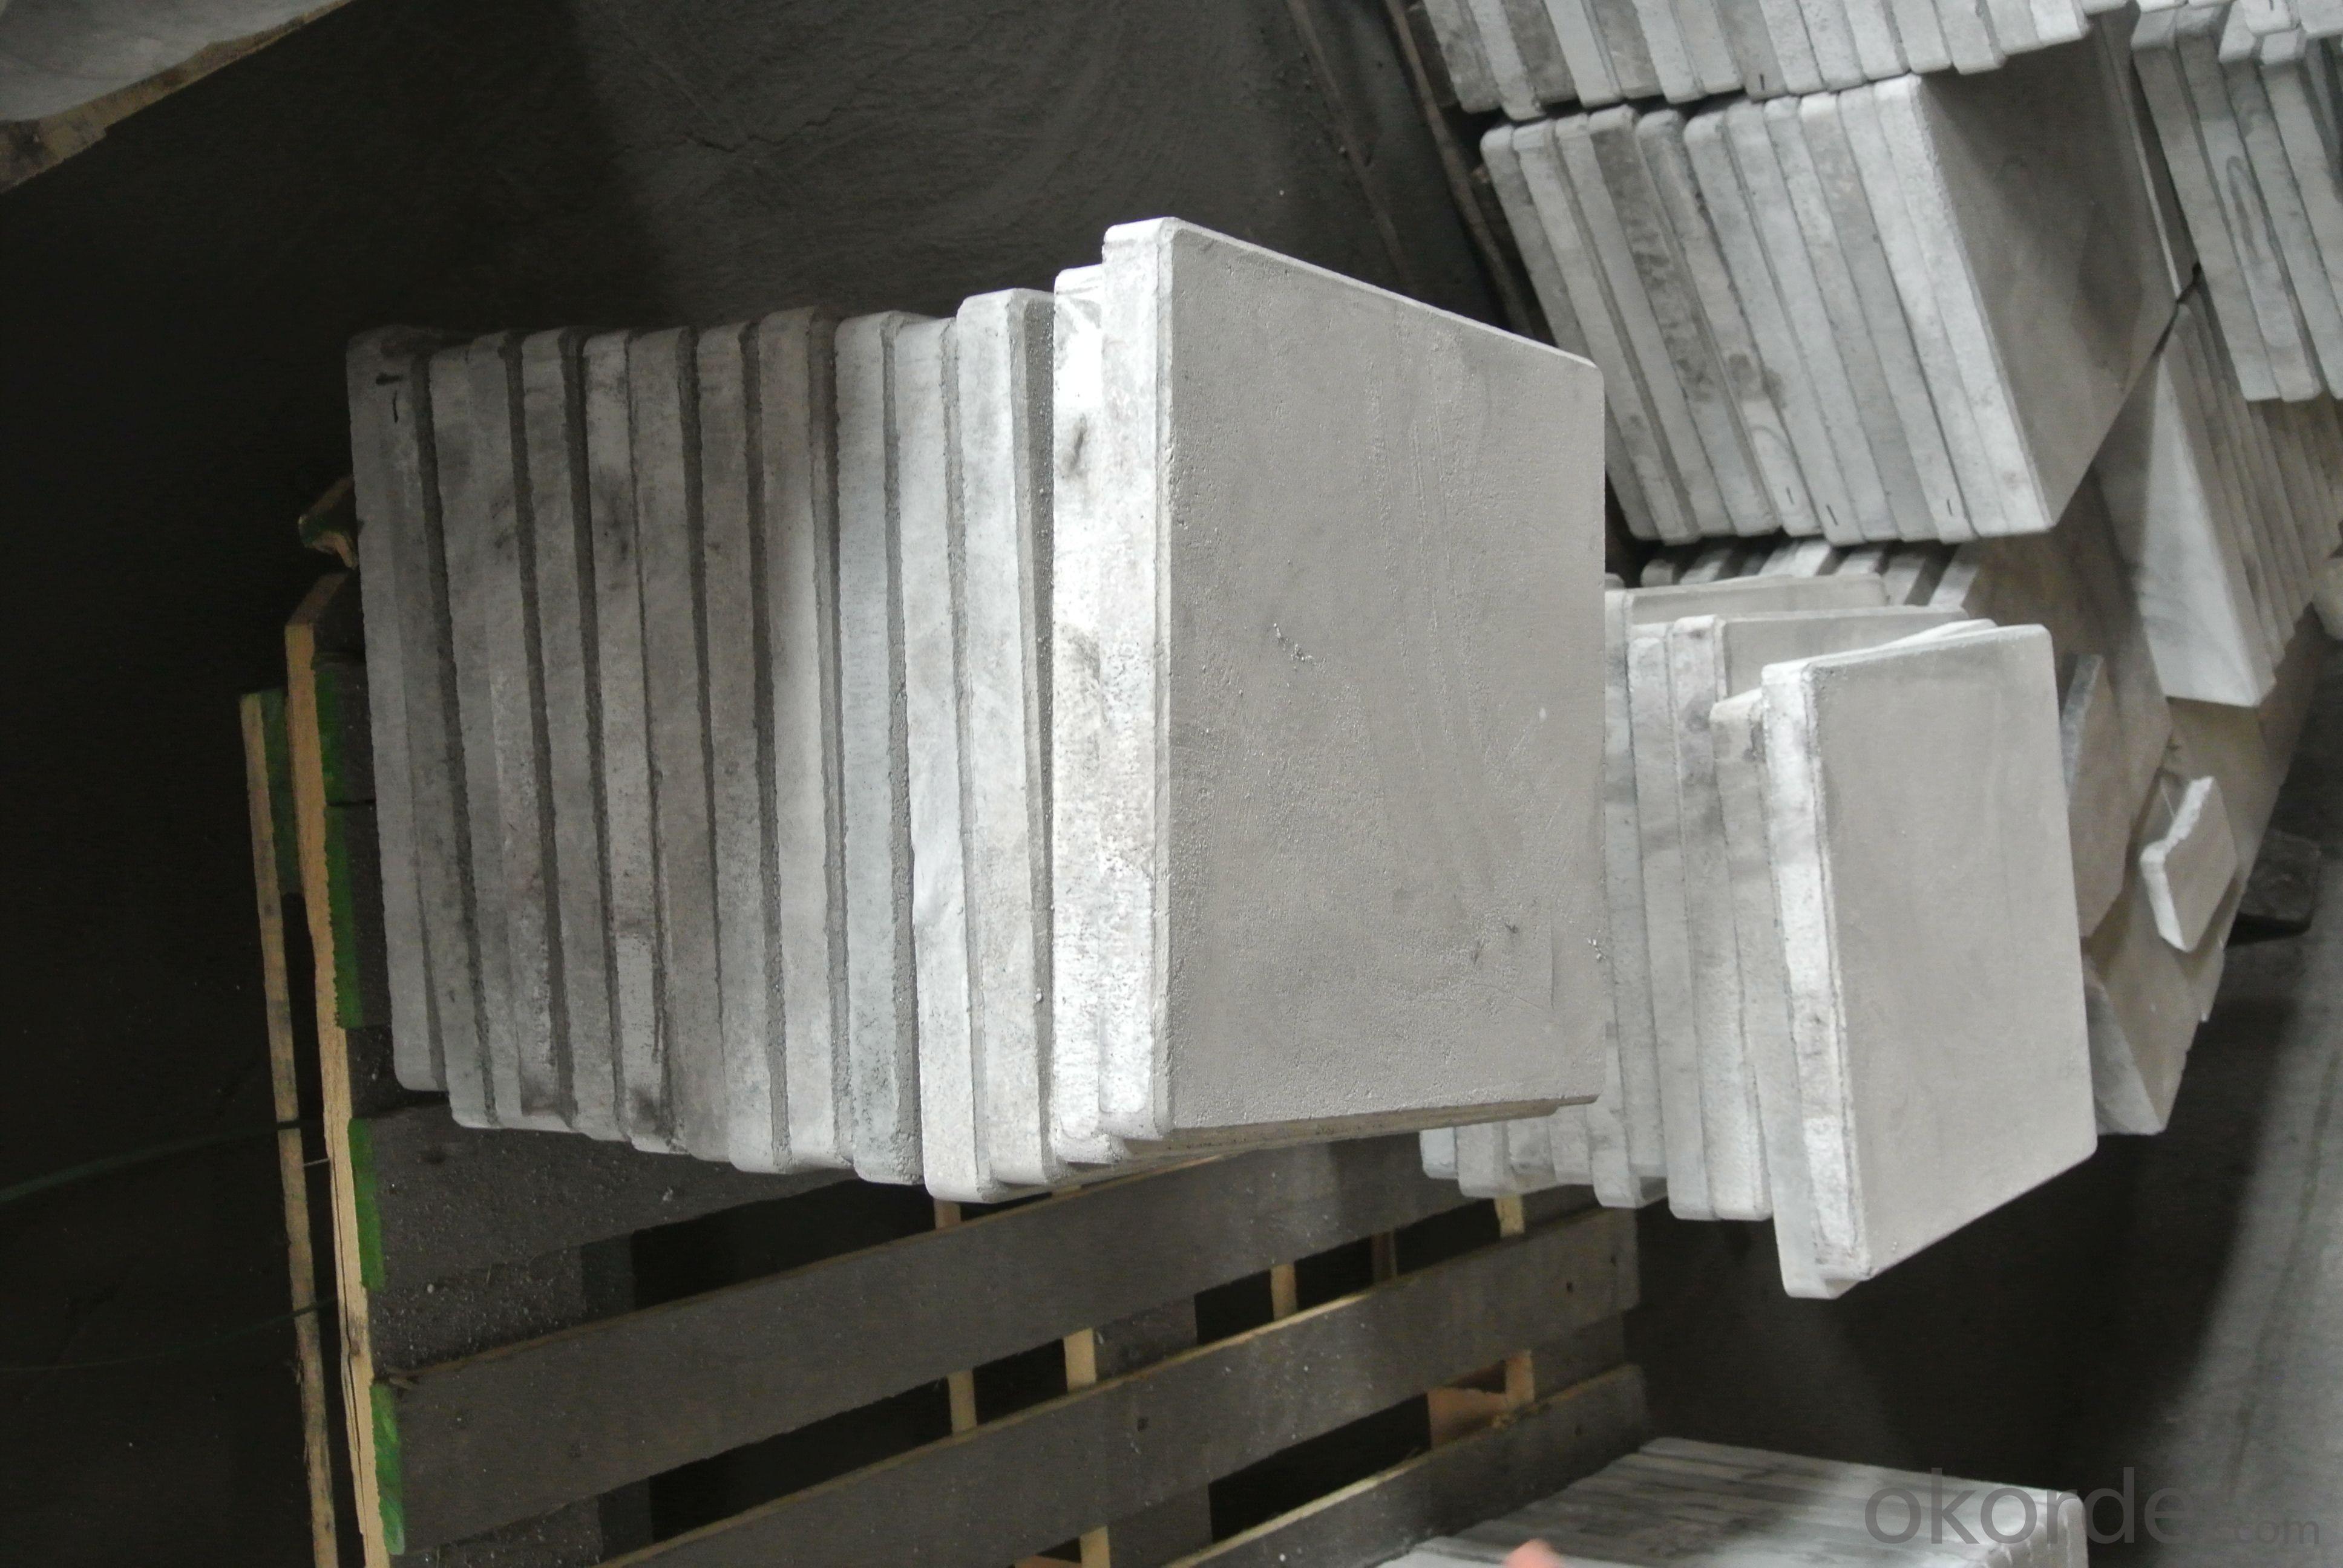 Silicon carbide bonded silicon nitride products - Sialon SiC corundum series mod